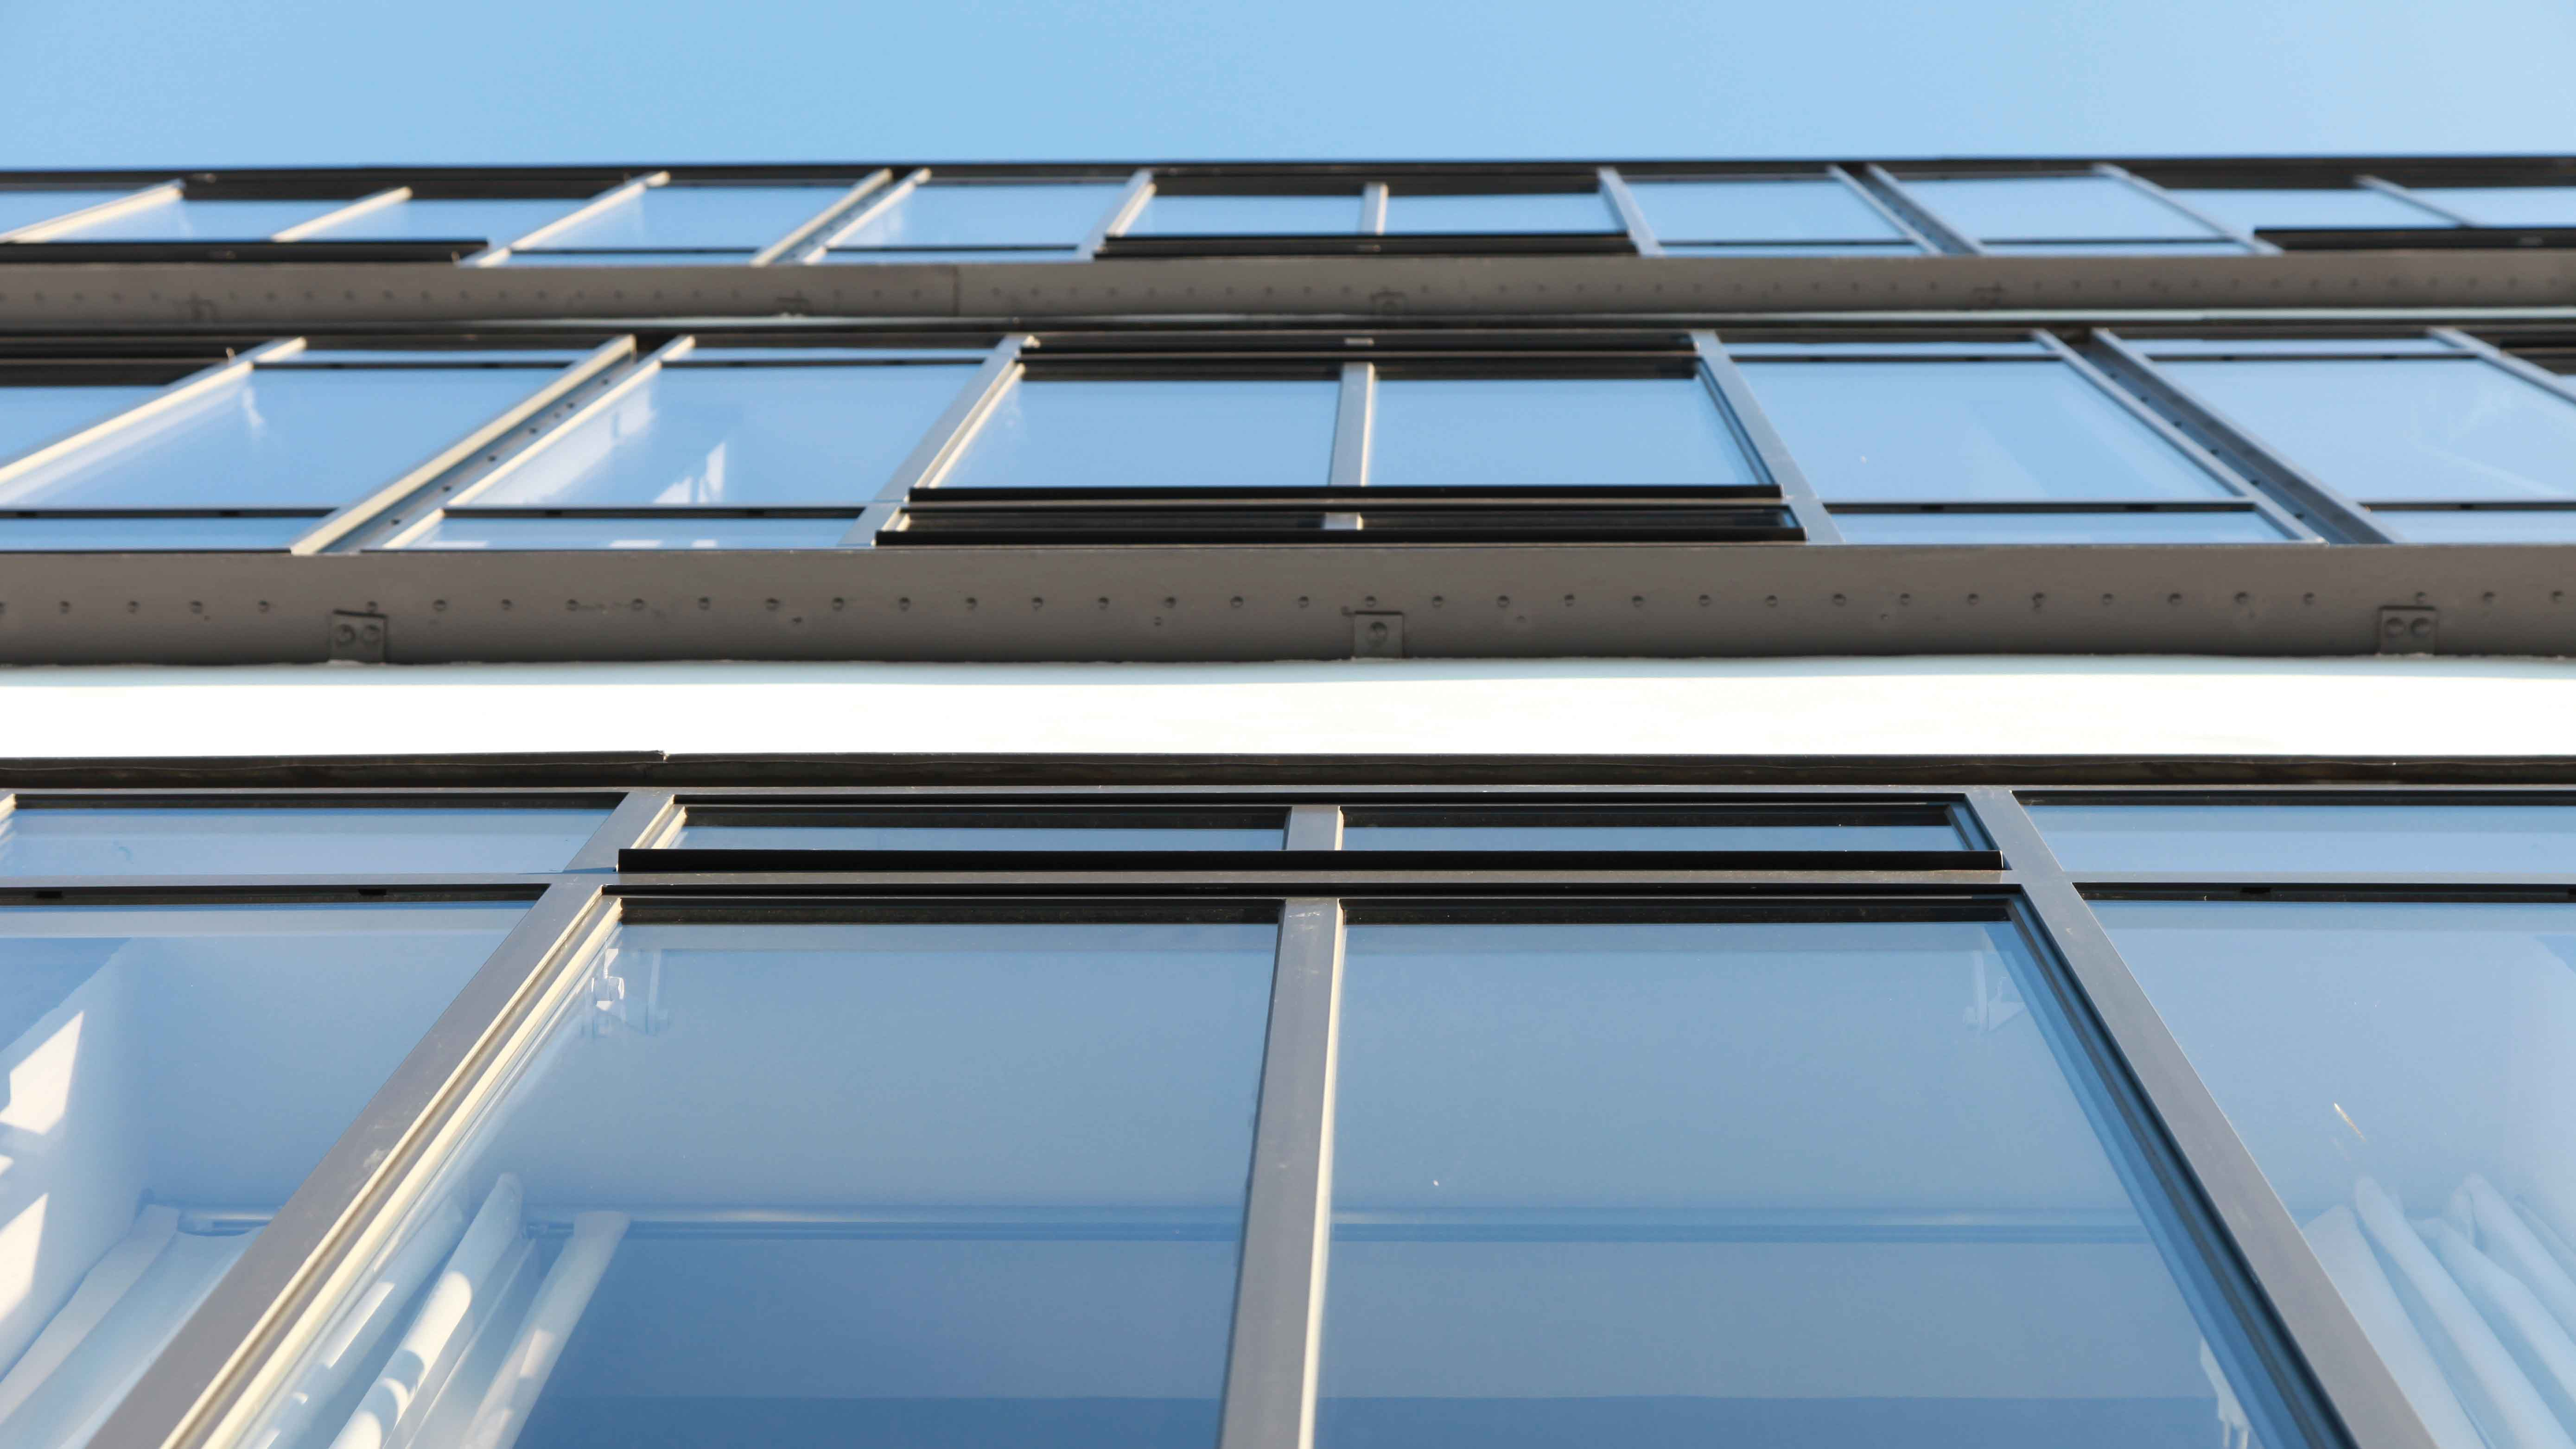 Bauhaus Dessau 8